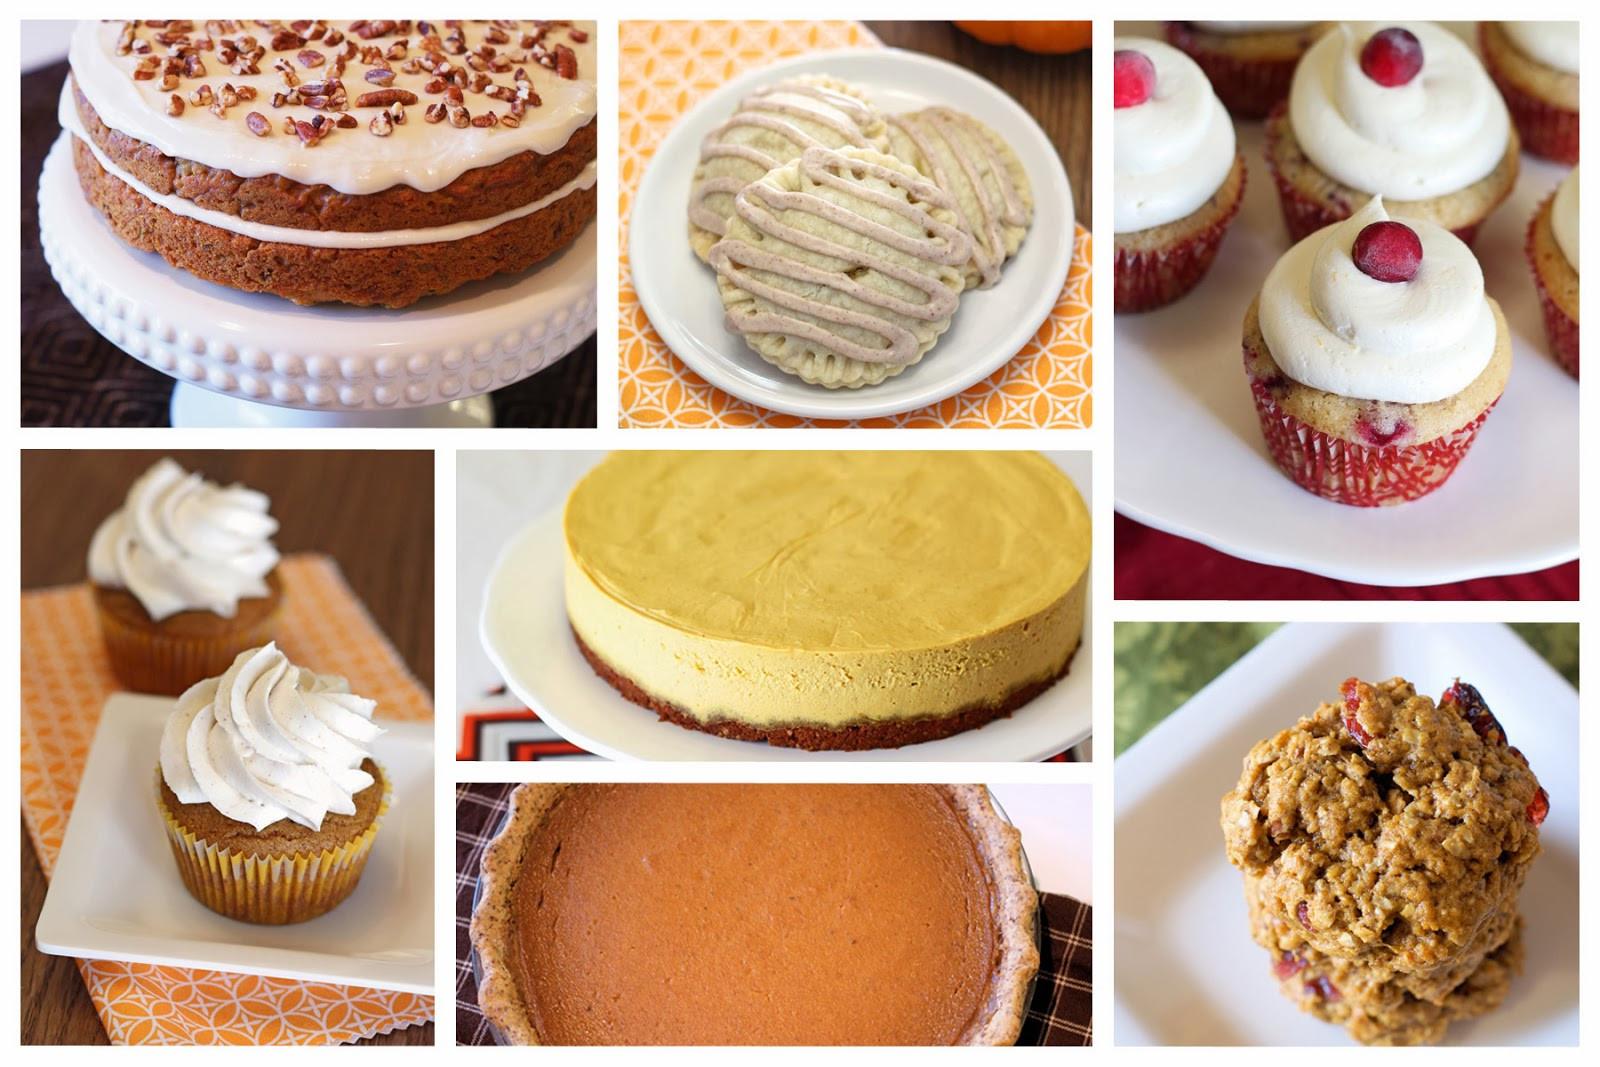 Vegan Thanksgiving Dessert Recipes  gluten free vegan thanksgiving desserts Sarah Bakes